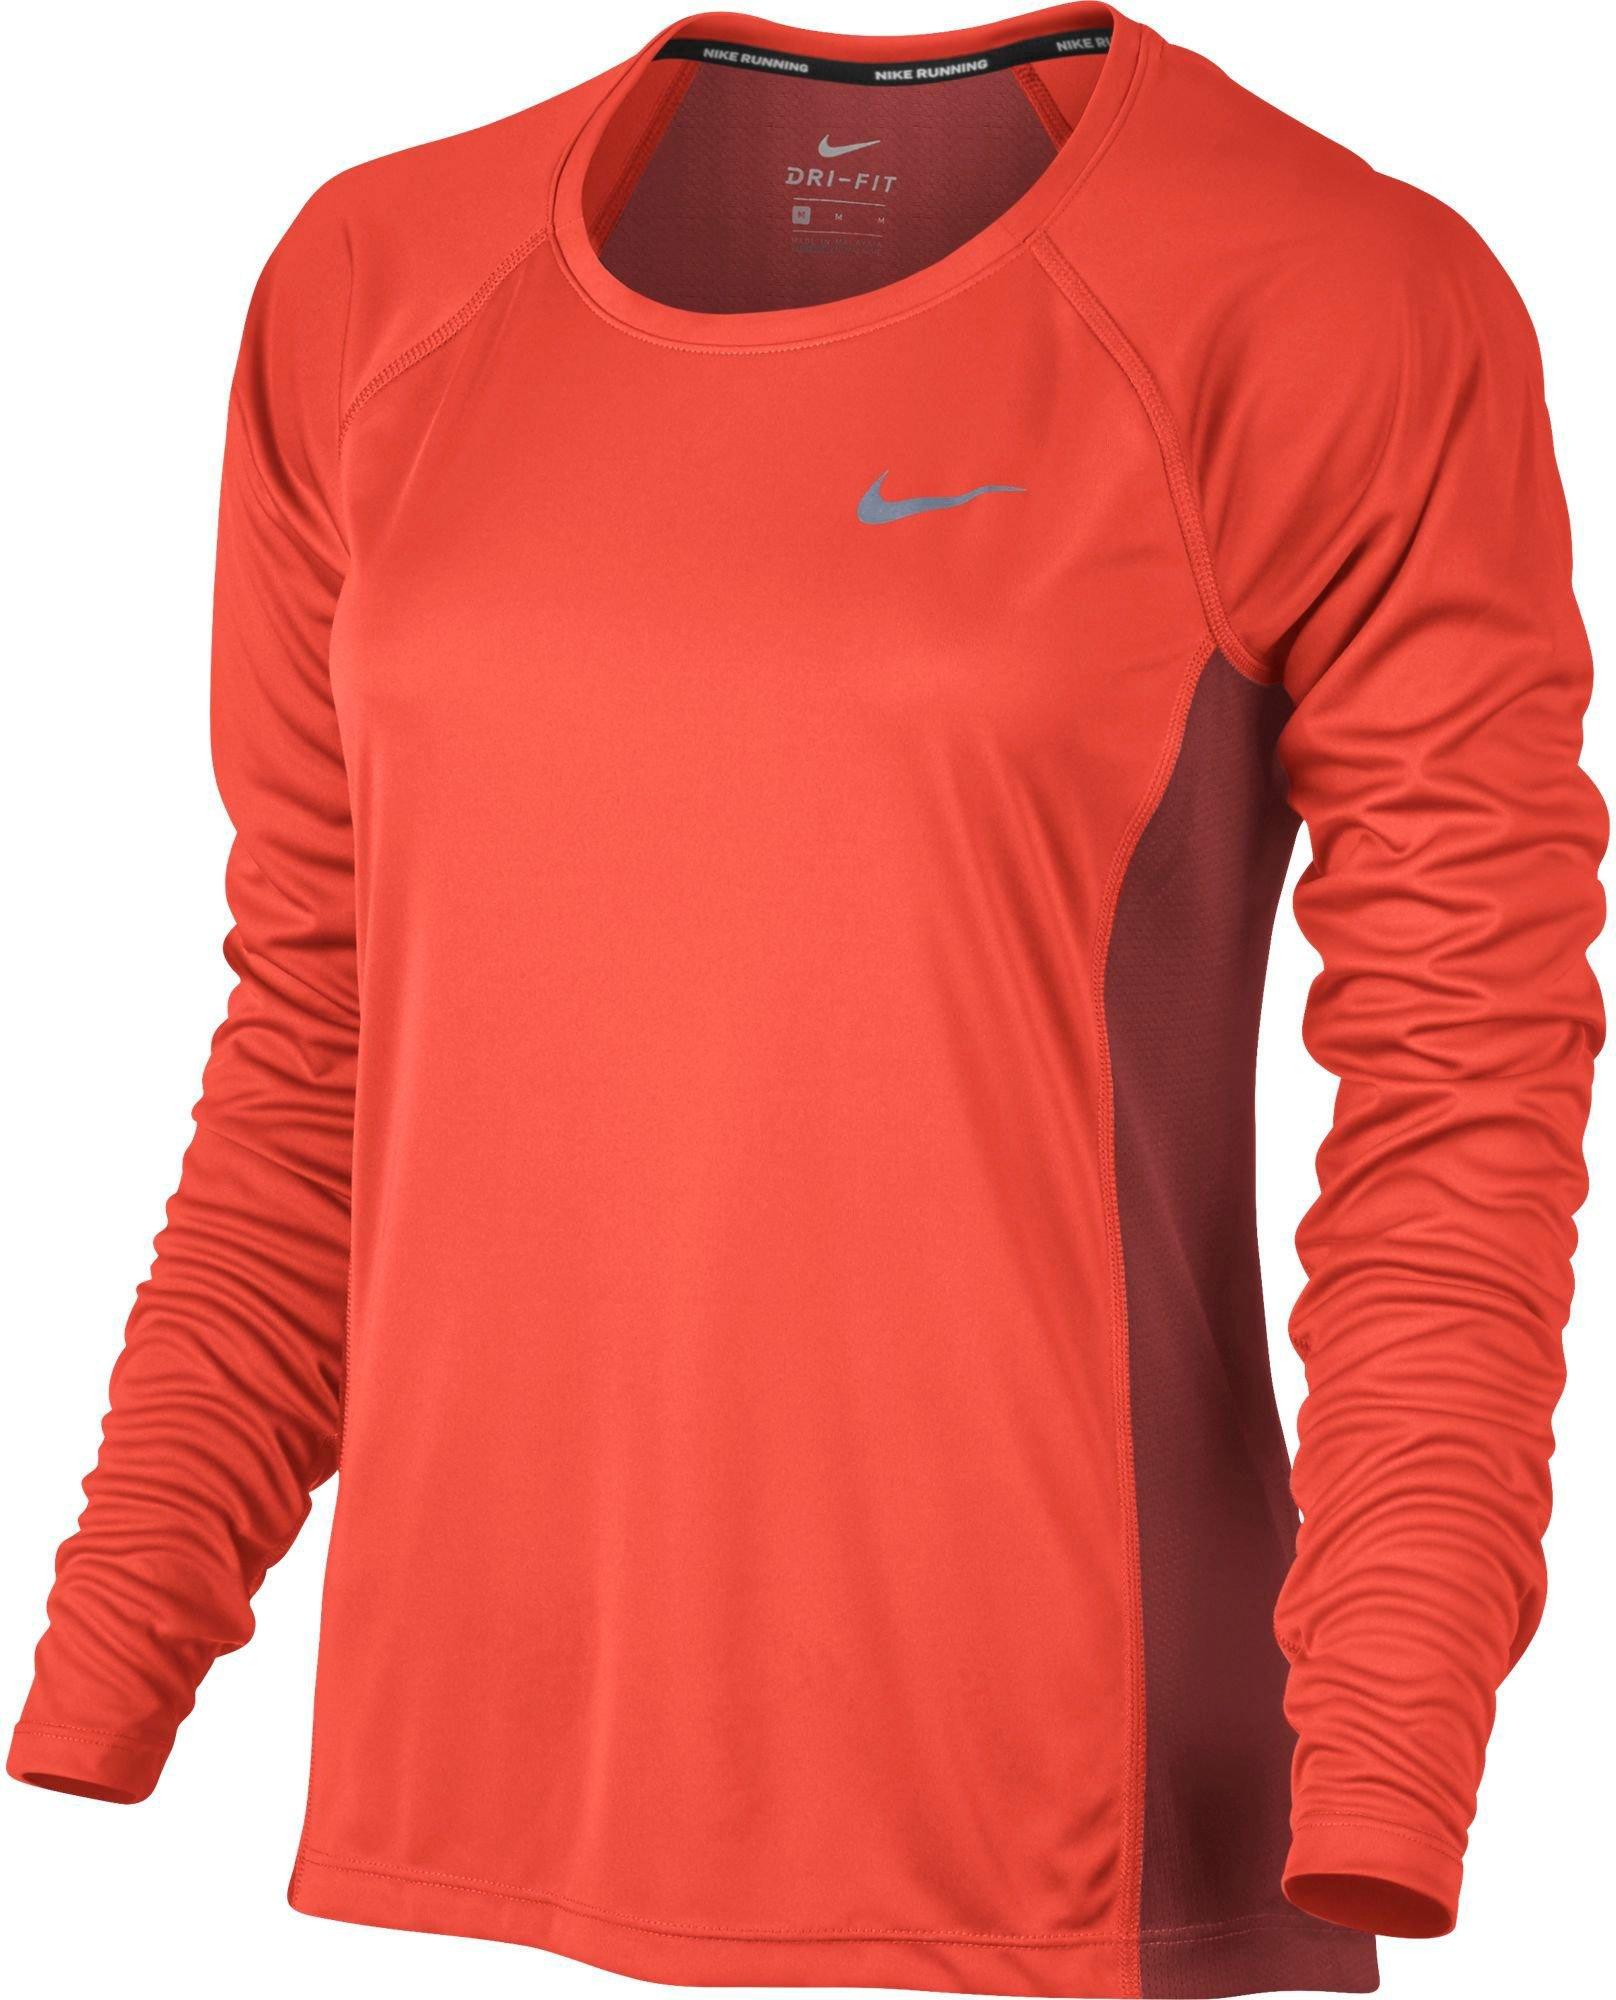 0e43c9fdaf337 Galleon - NIKE Women's Dri-Fit Miler Long Sleeve T-Shirt Fresh Mint/Electro  Green/Reflective Silver 831540-300 (Medium)